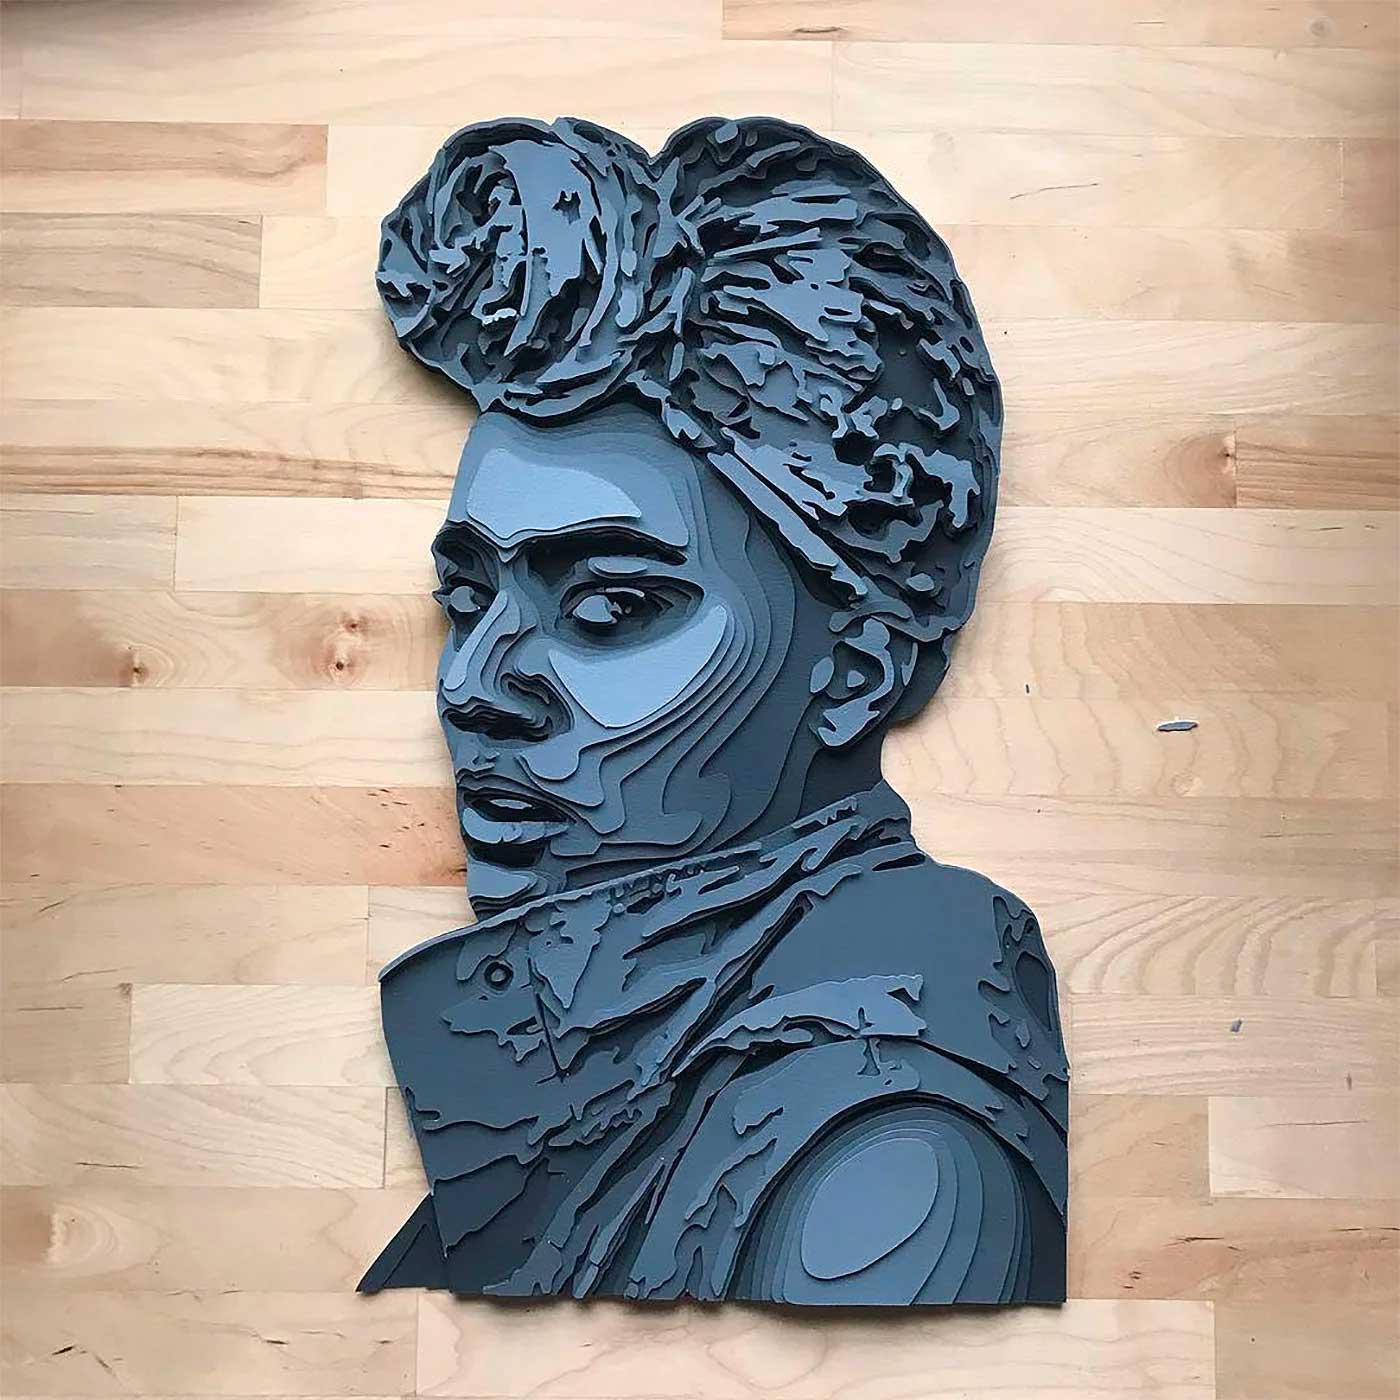 Papier-Portraits von Shelley Castillo Garcia Shelley-Castillo-Garcia-papier-portraits-ebenen_04